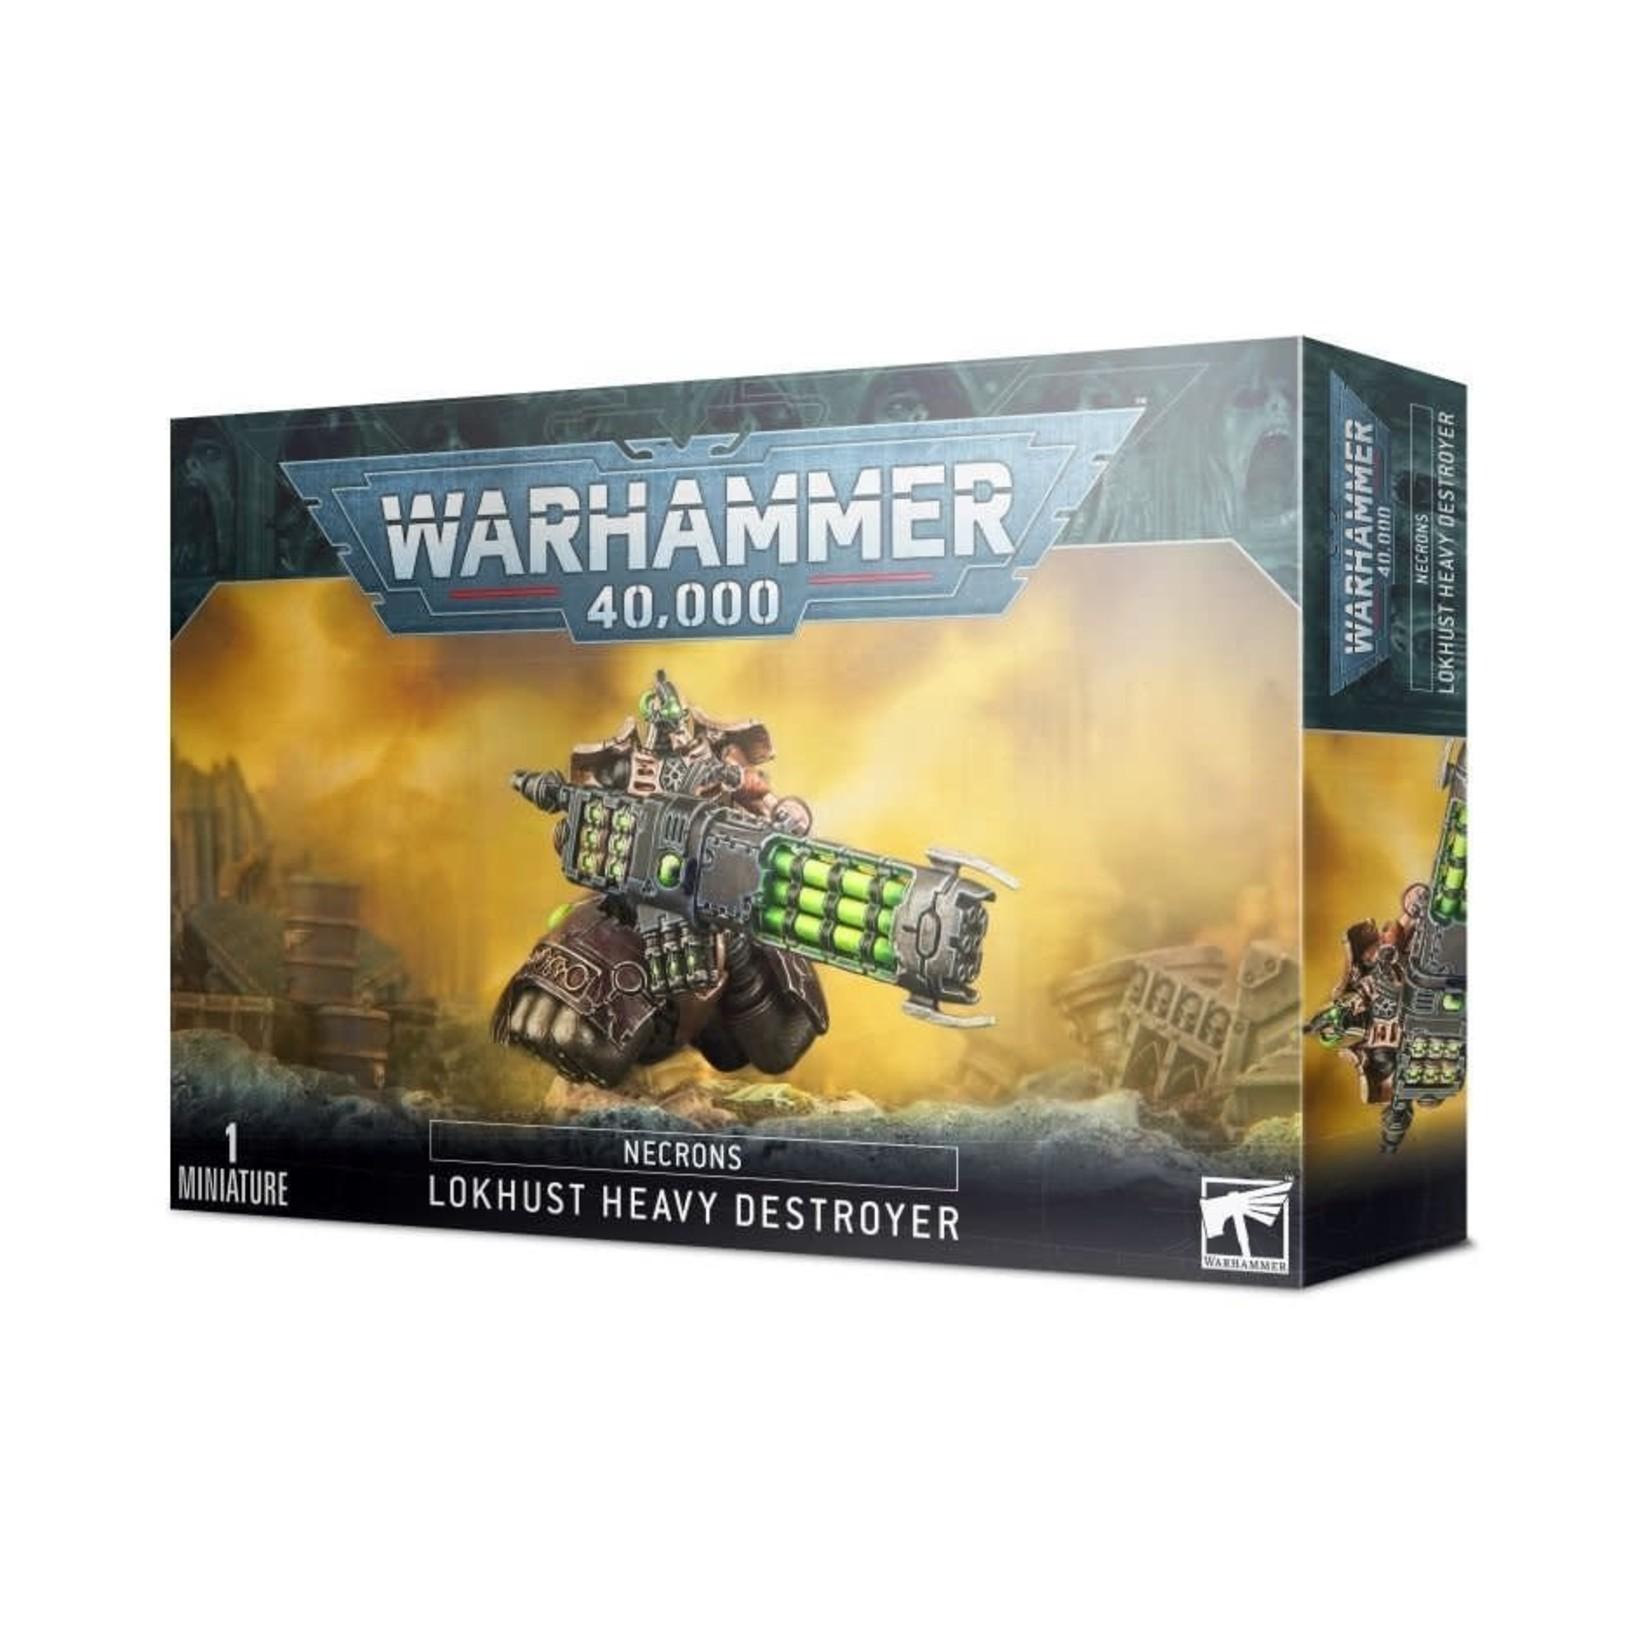 Games Workshop Warhammer 40k: Necrons - Lokhust Heavy Destroyer